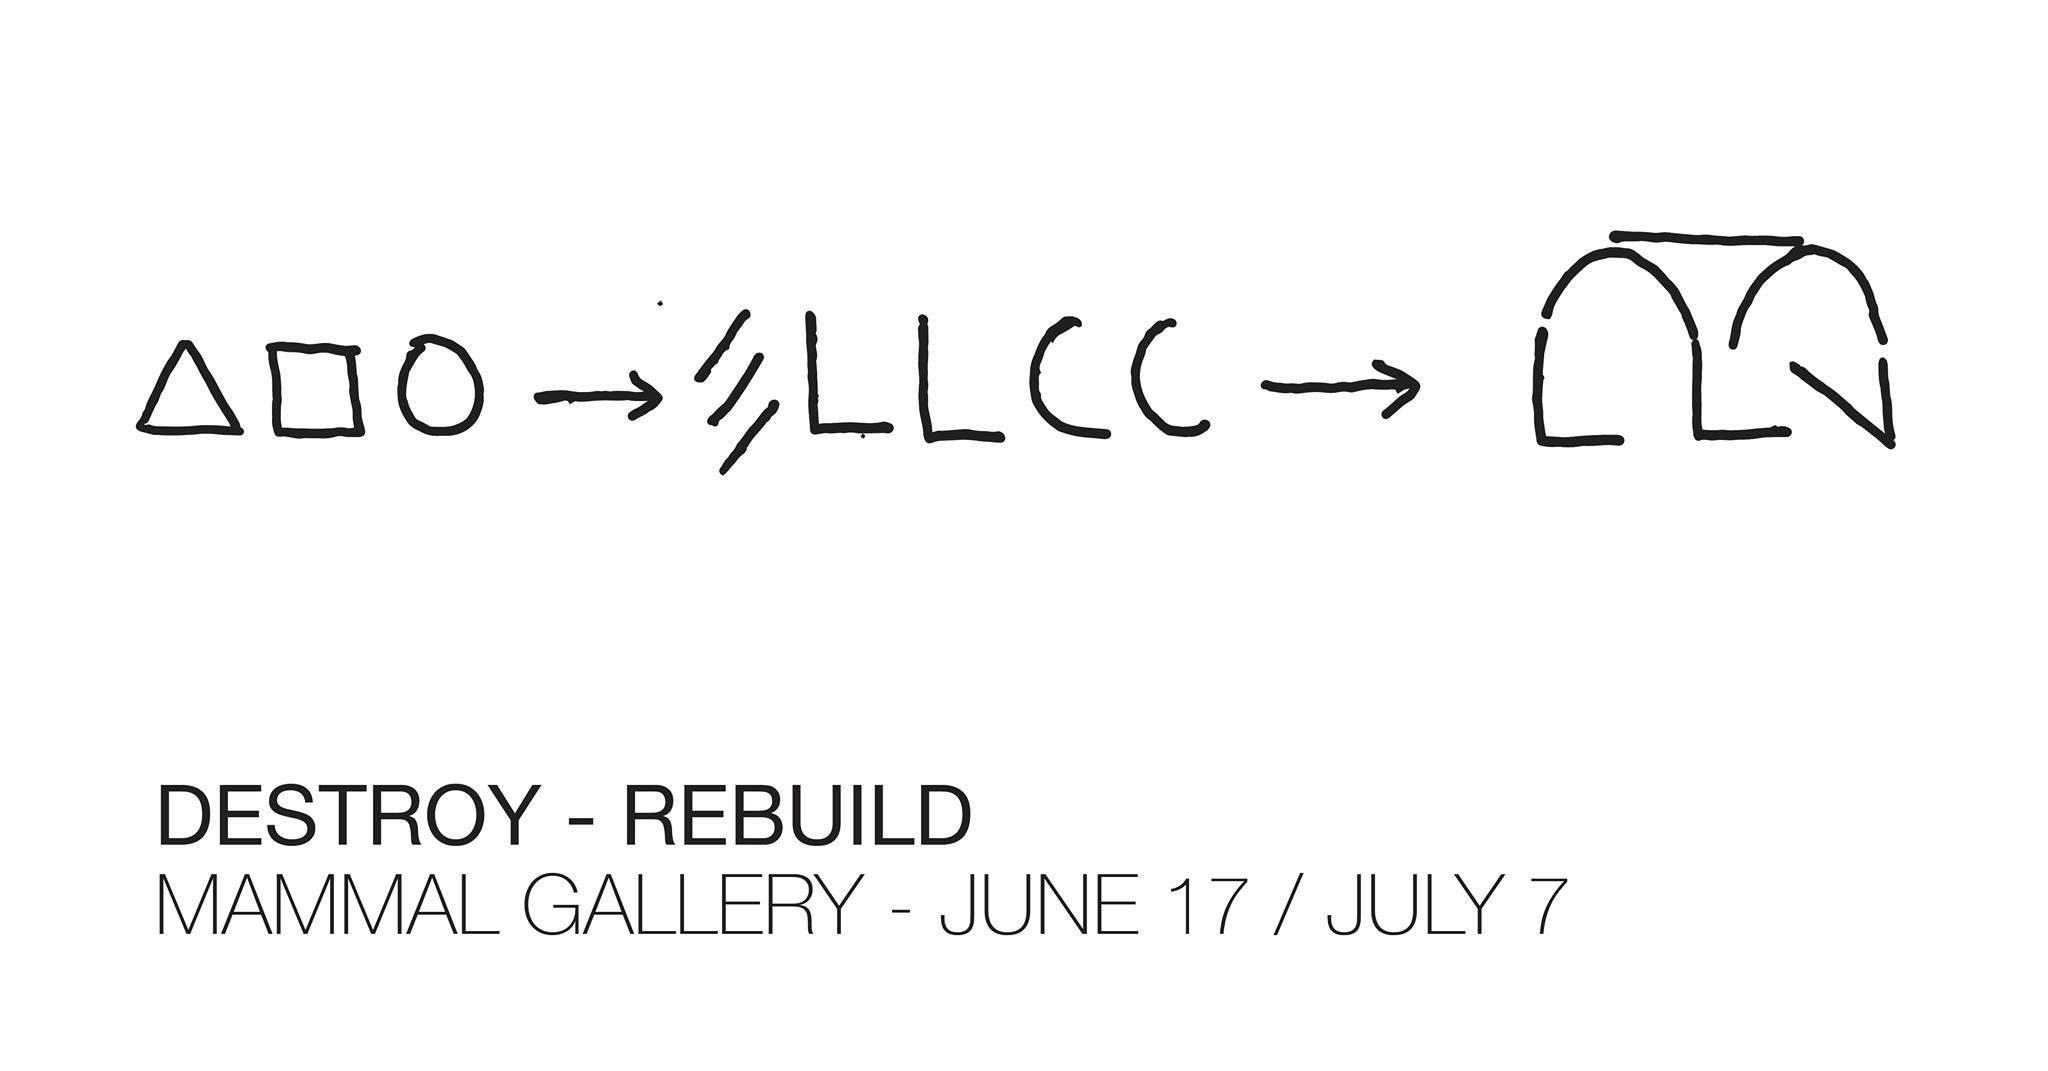 Destroy - Rebuild Mammal Gallery June 17th through July 7th